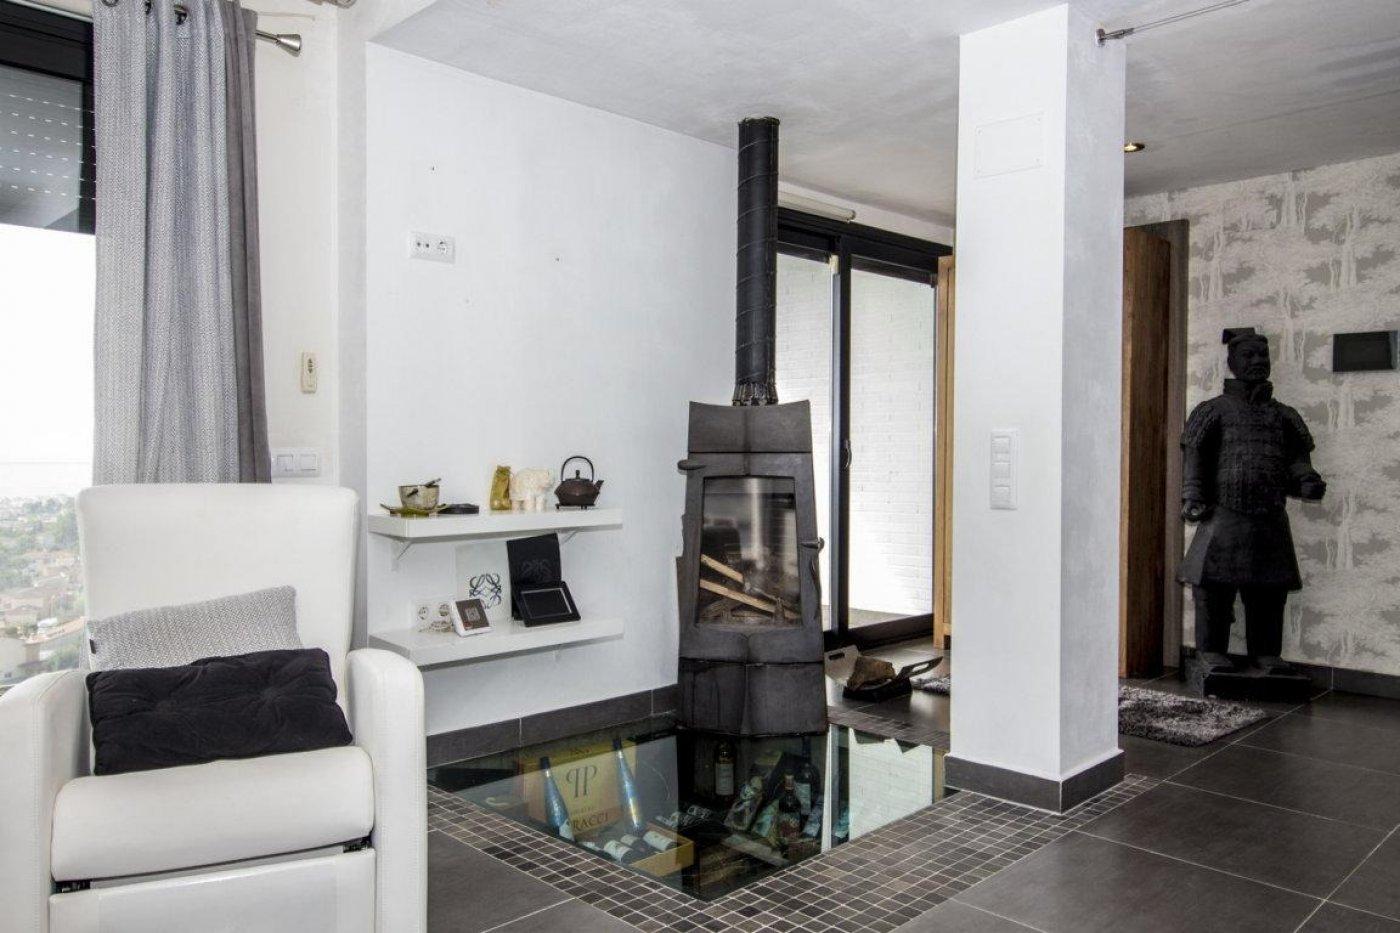 Casa exclusiva con piscina - imagenInmueble9